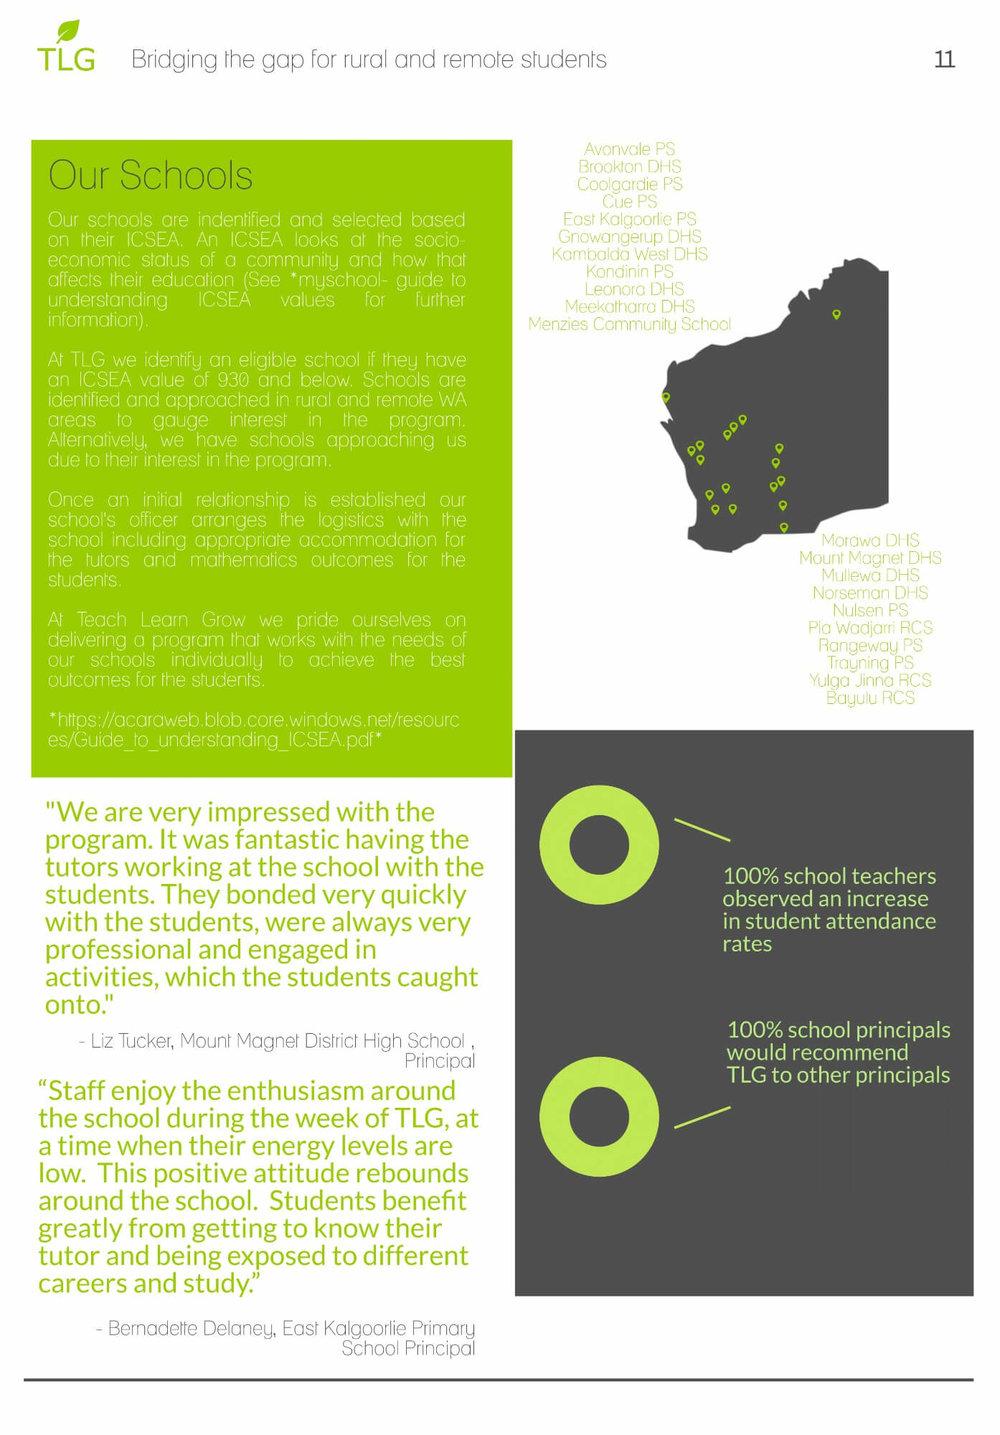 tlg-annual-report-FY16-11.jpg